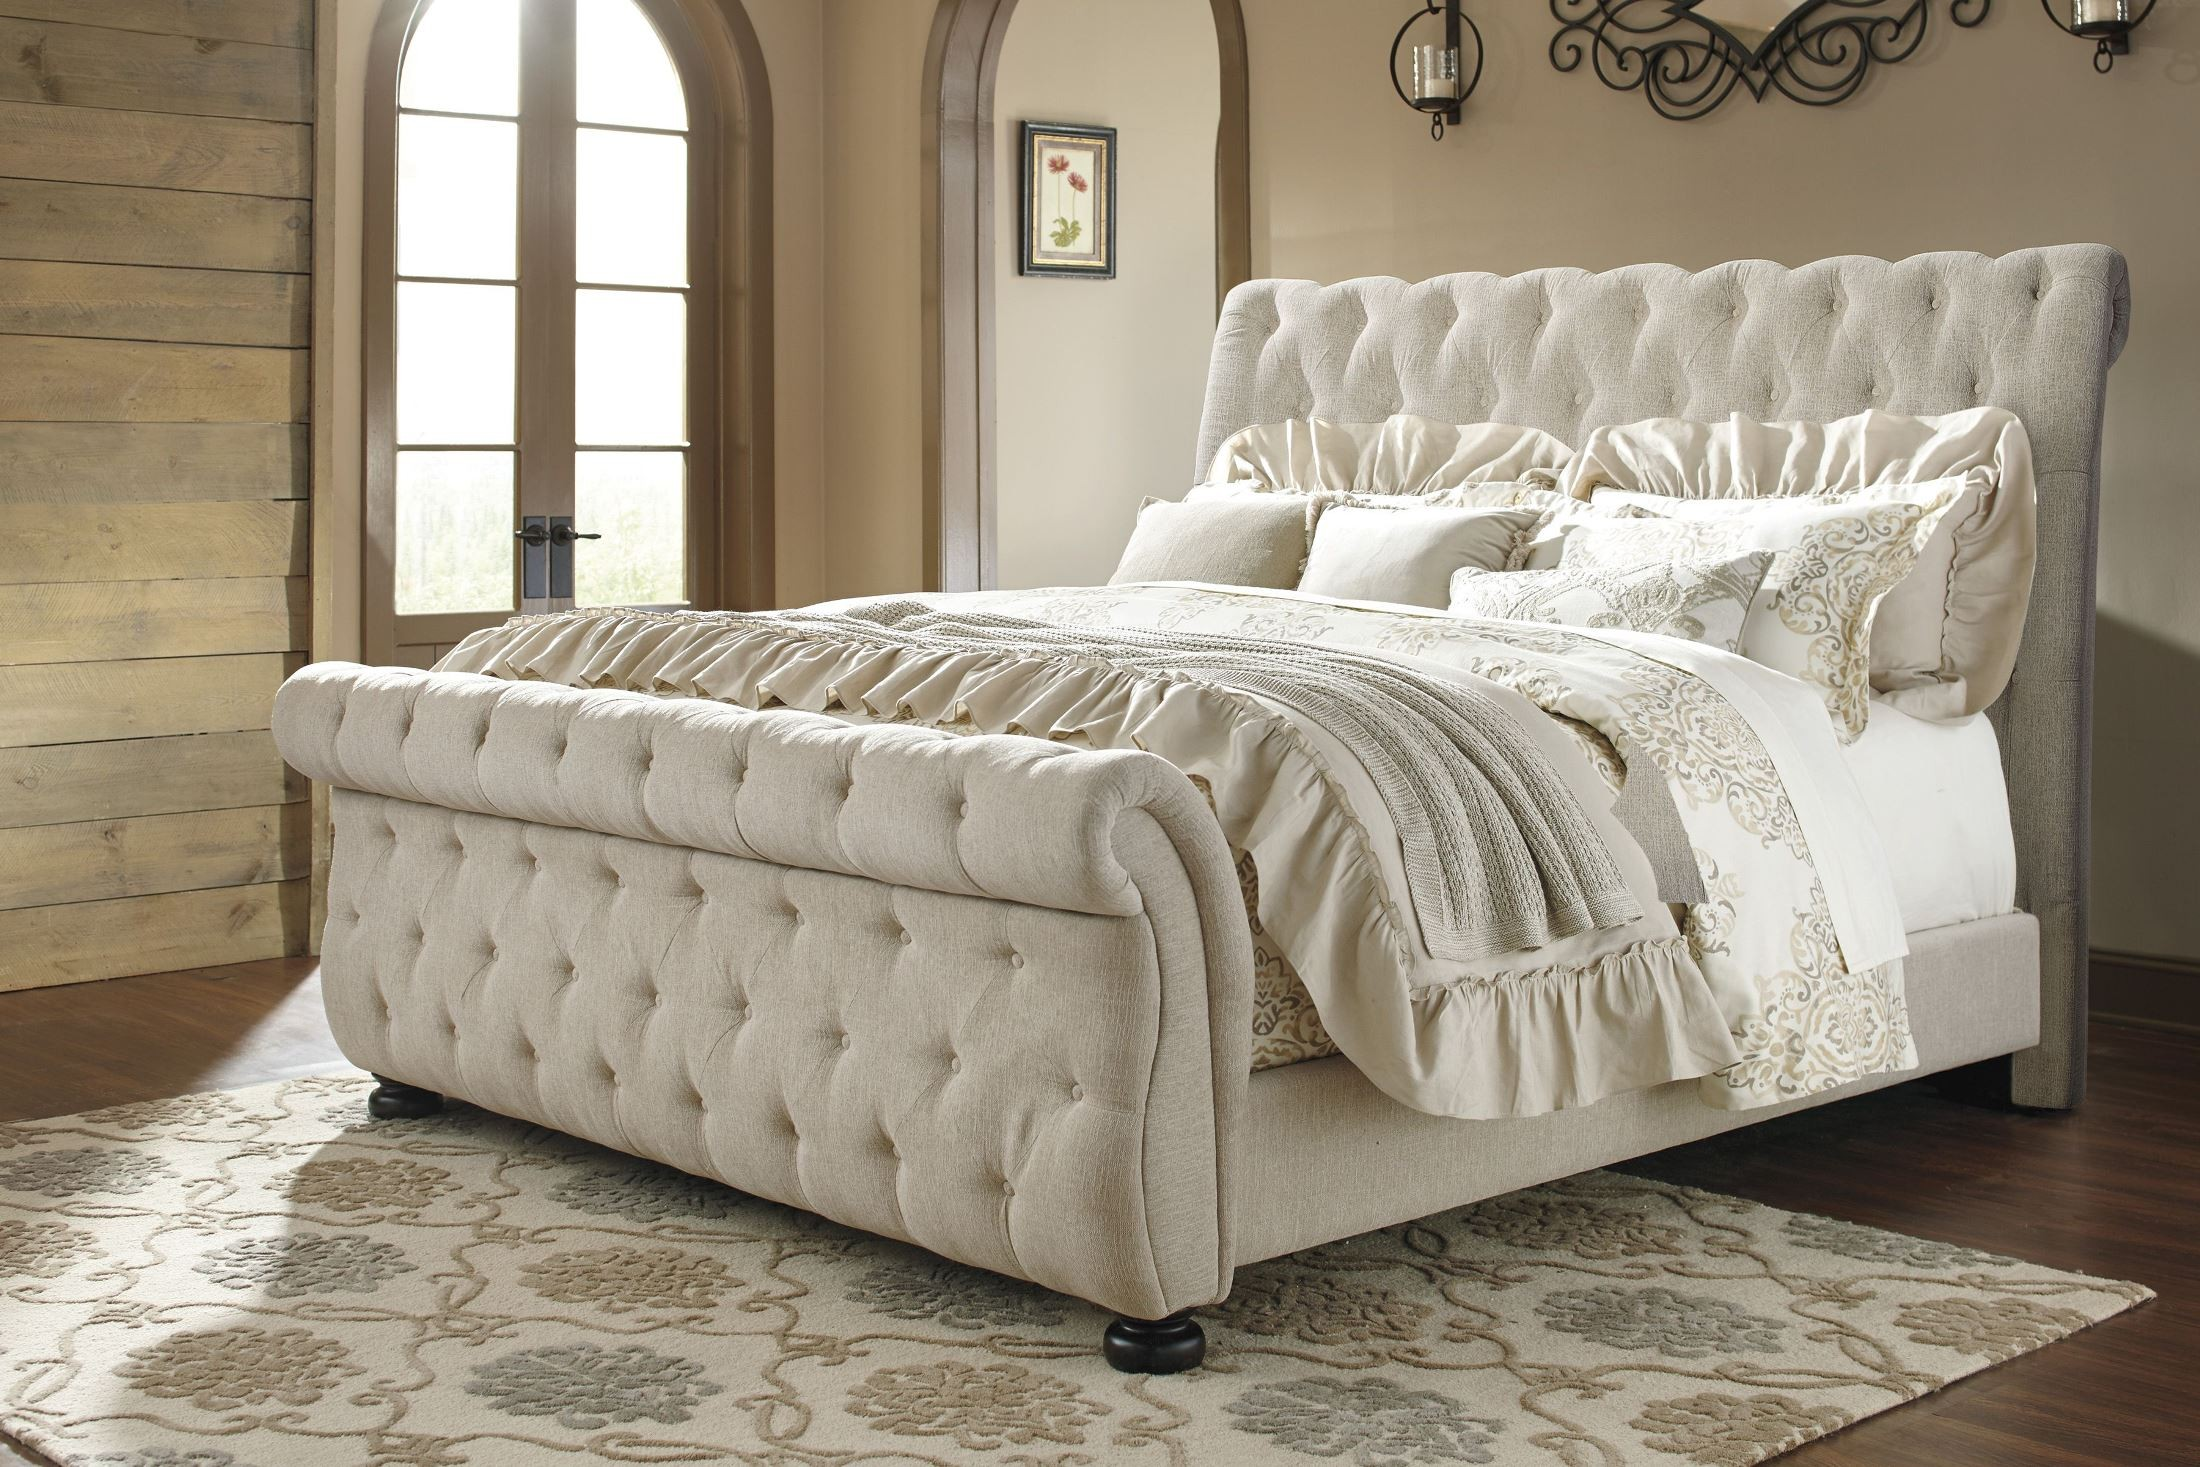 Willenburg Linen Cal King Upholstered Sleigh Bed From